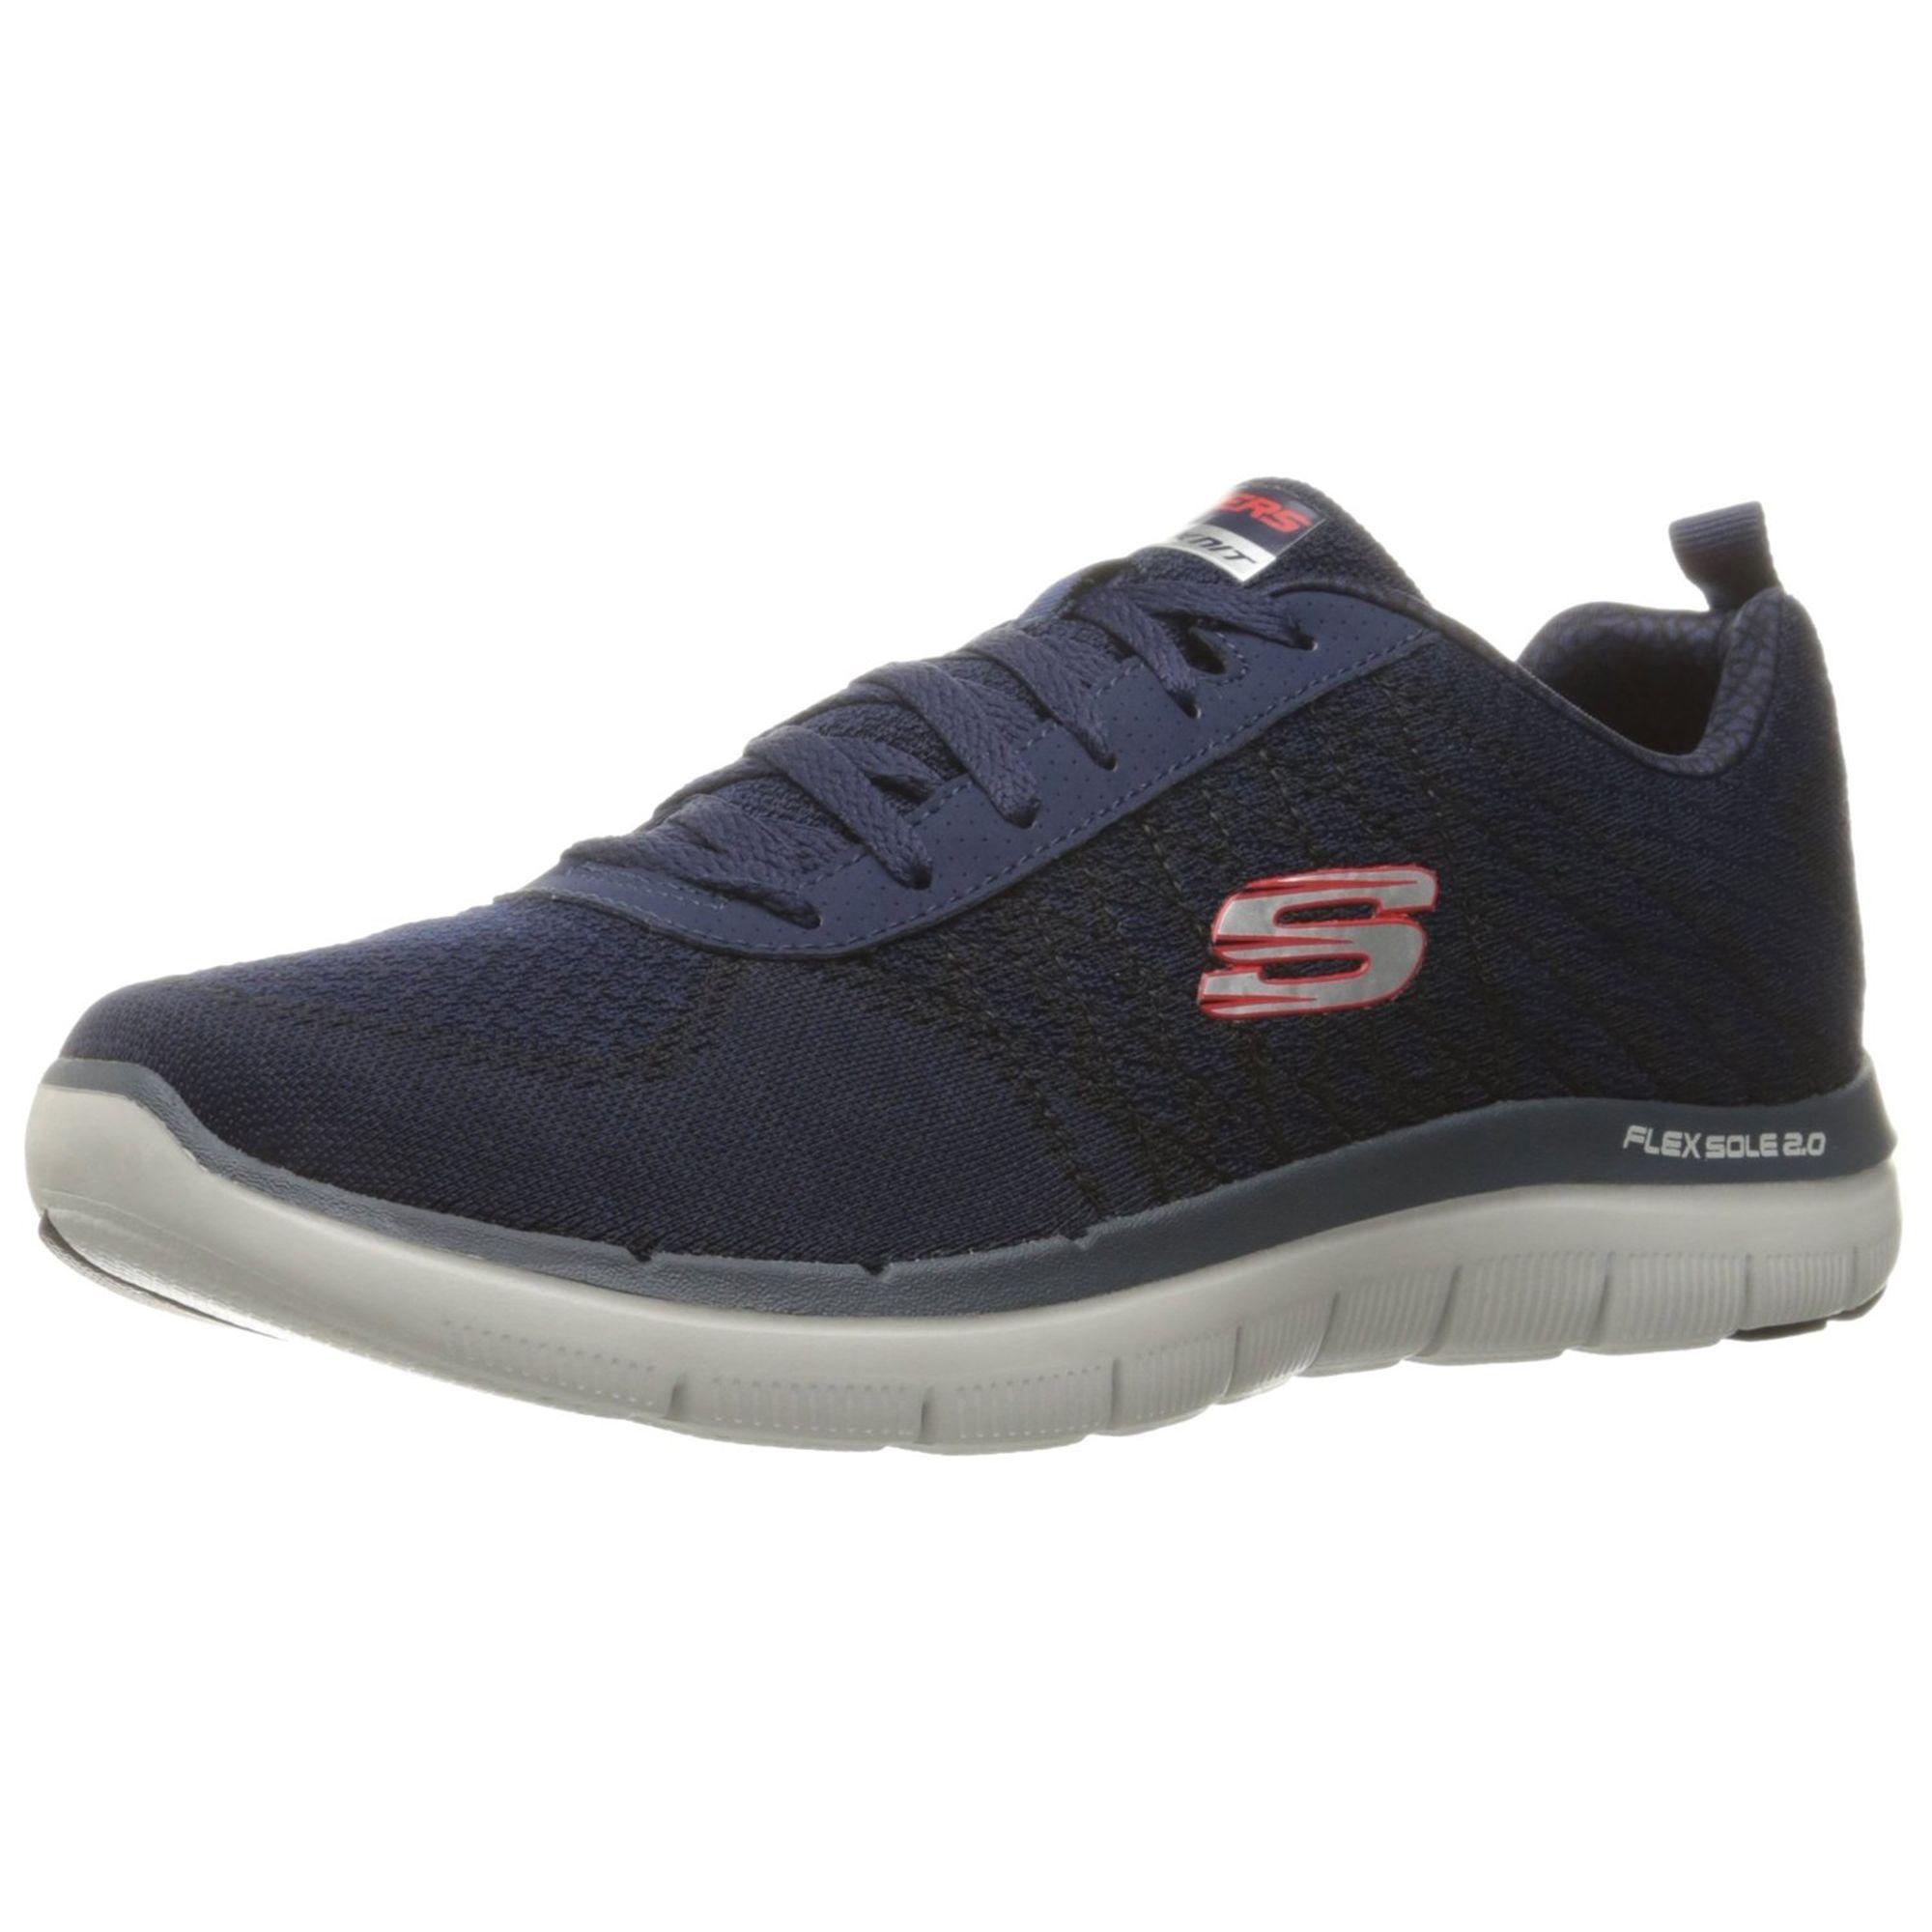 Shoes For Flat Feet Skechers